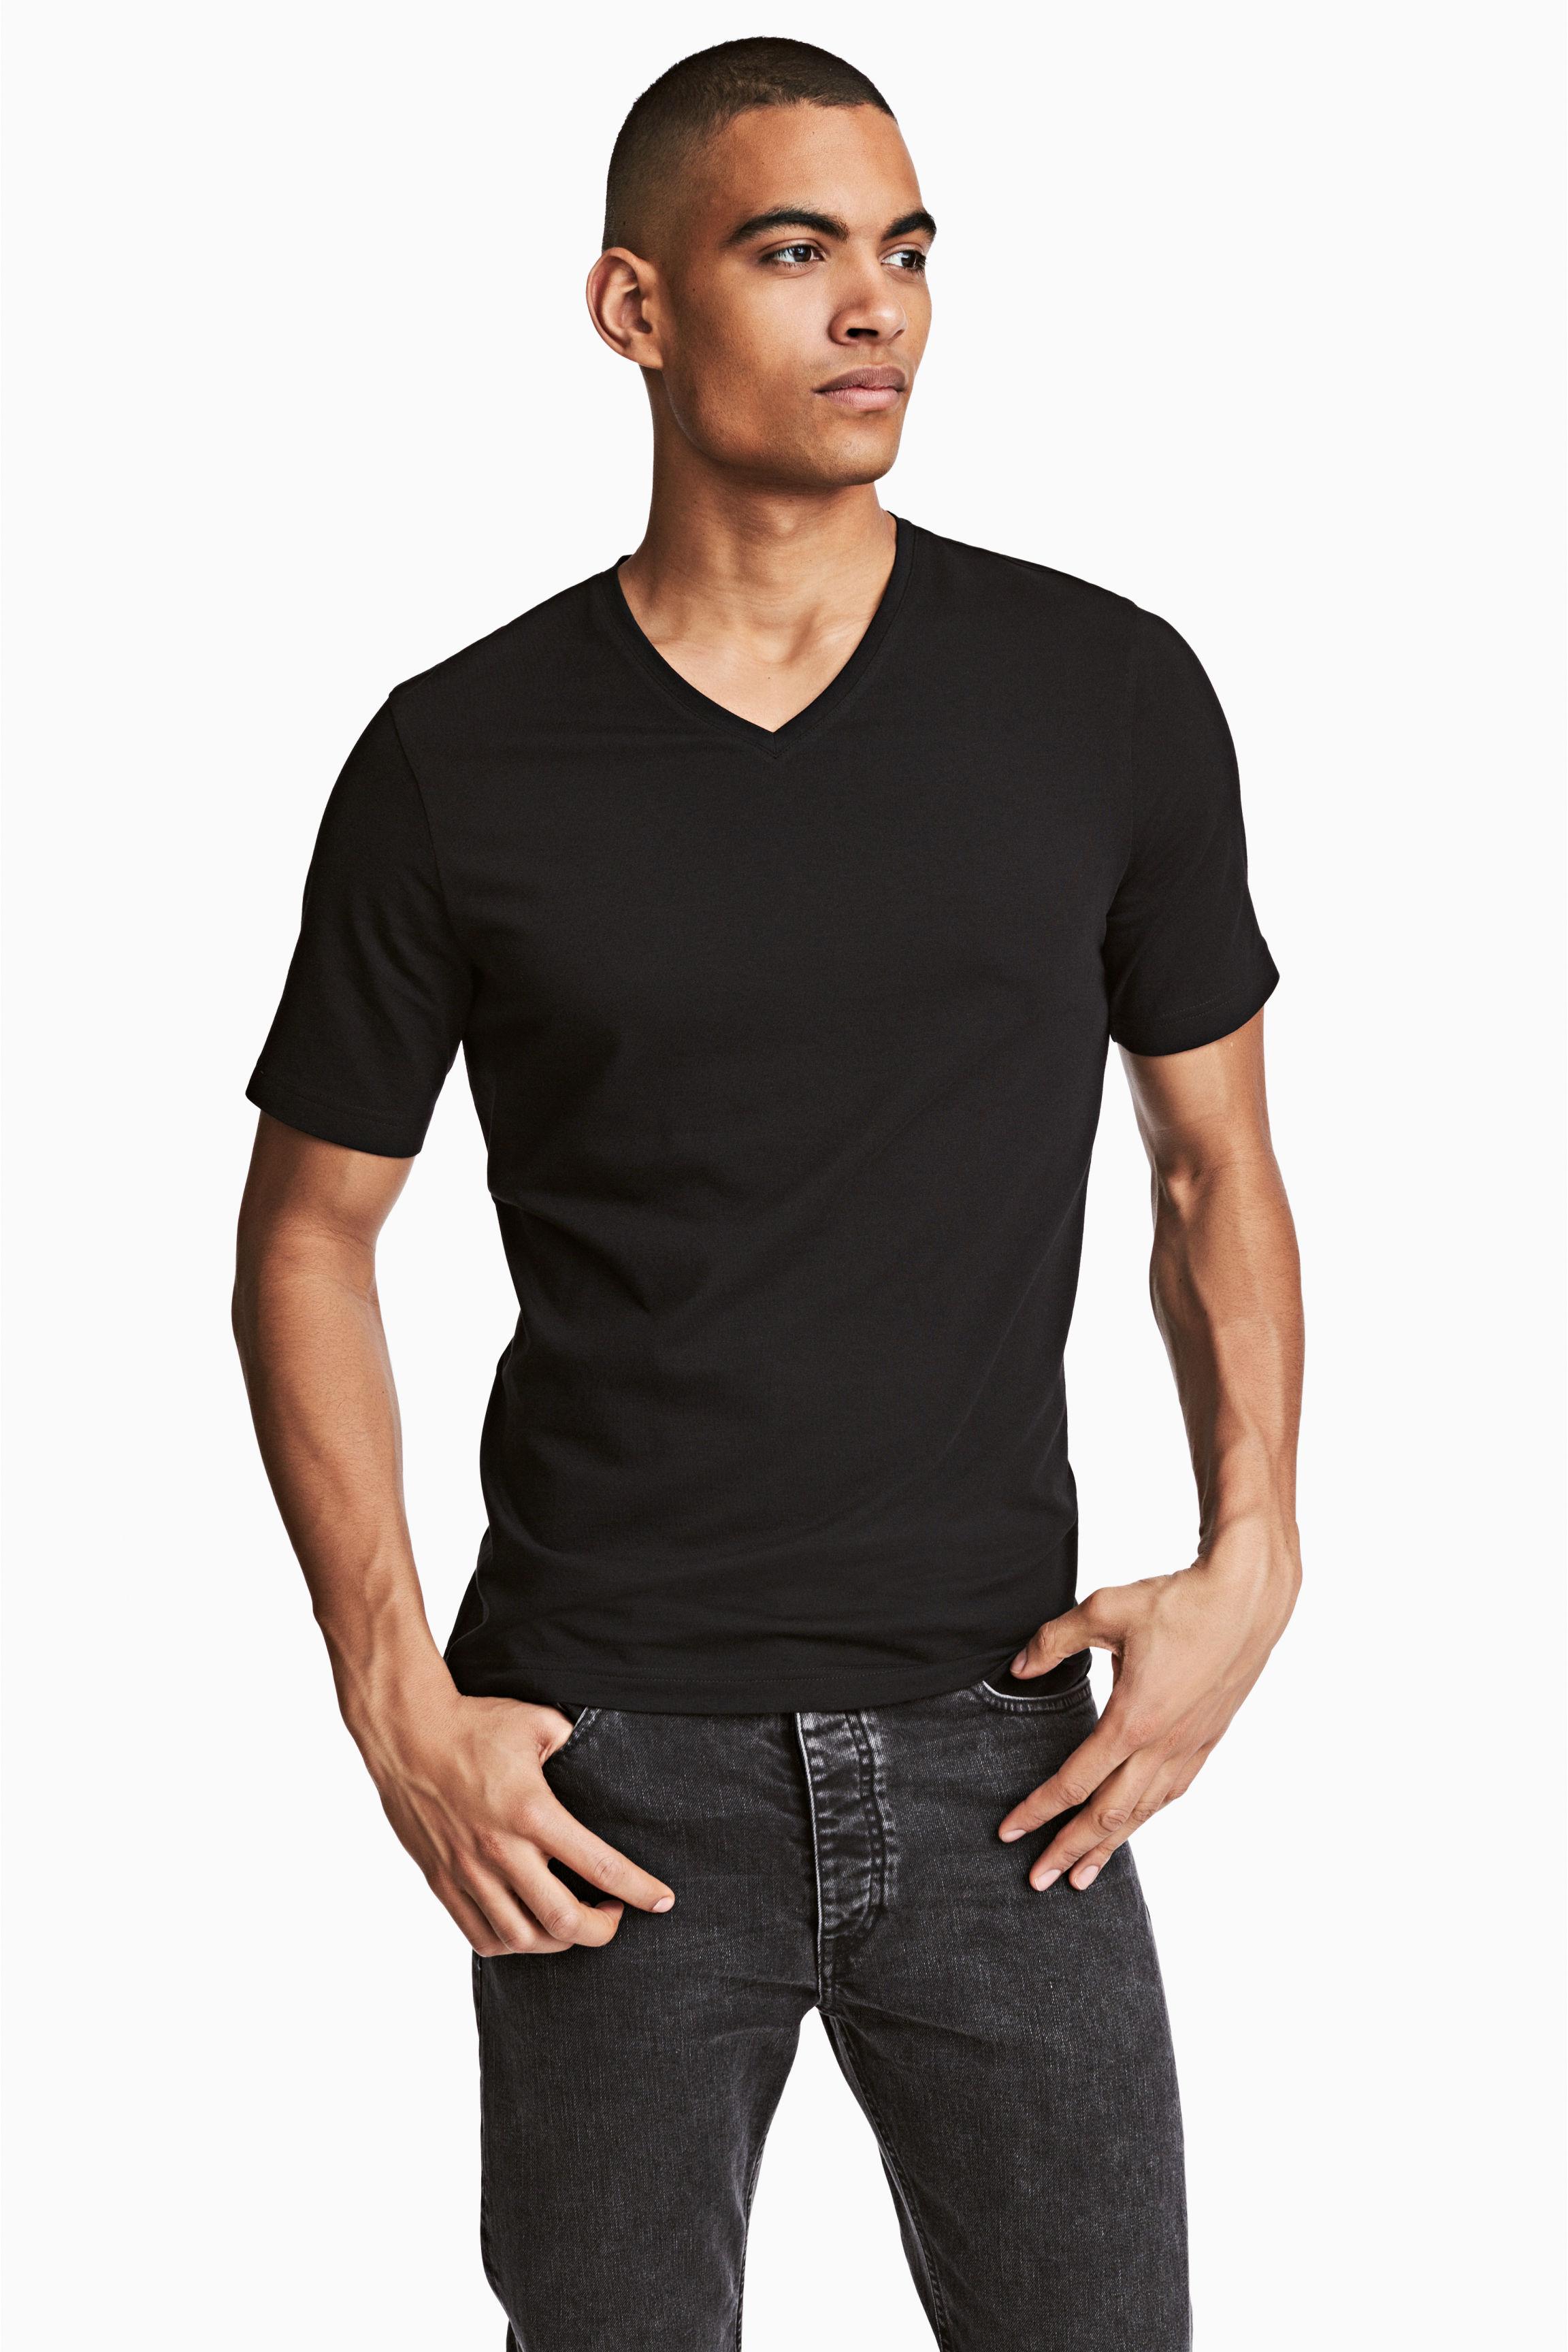 Black t shirt man - Black T Shirt Man 7